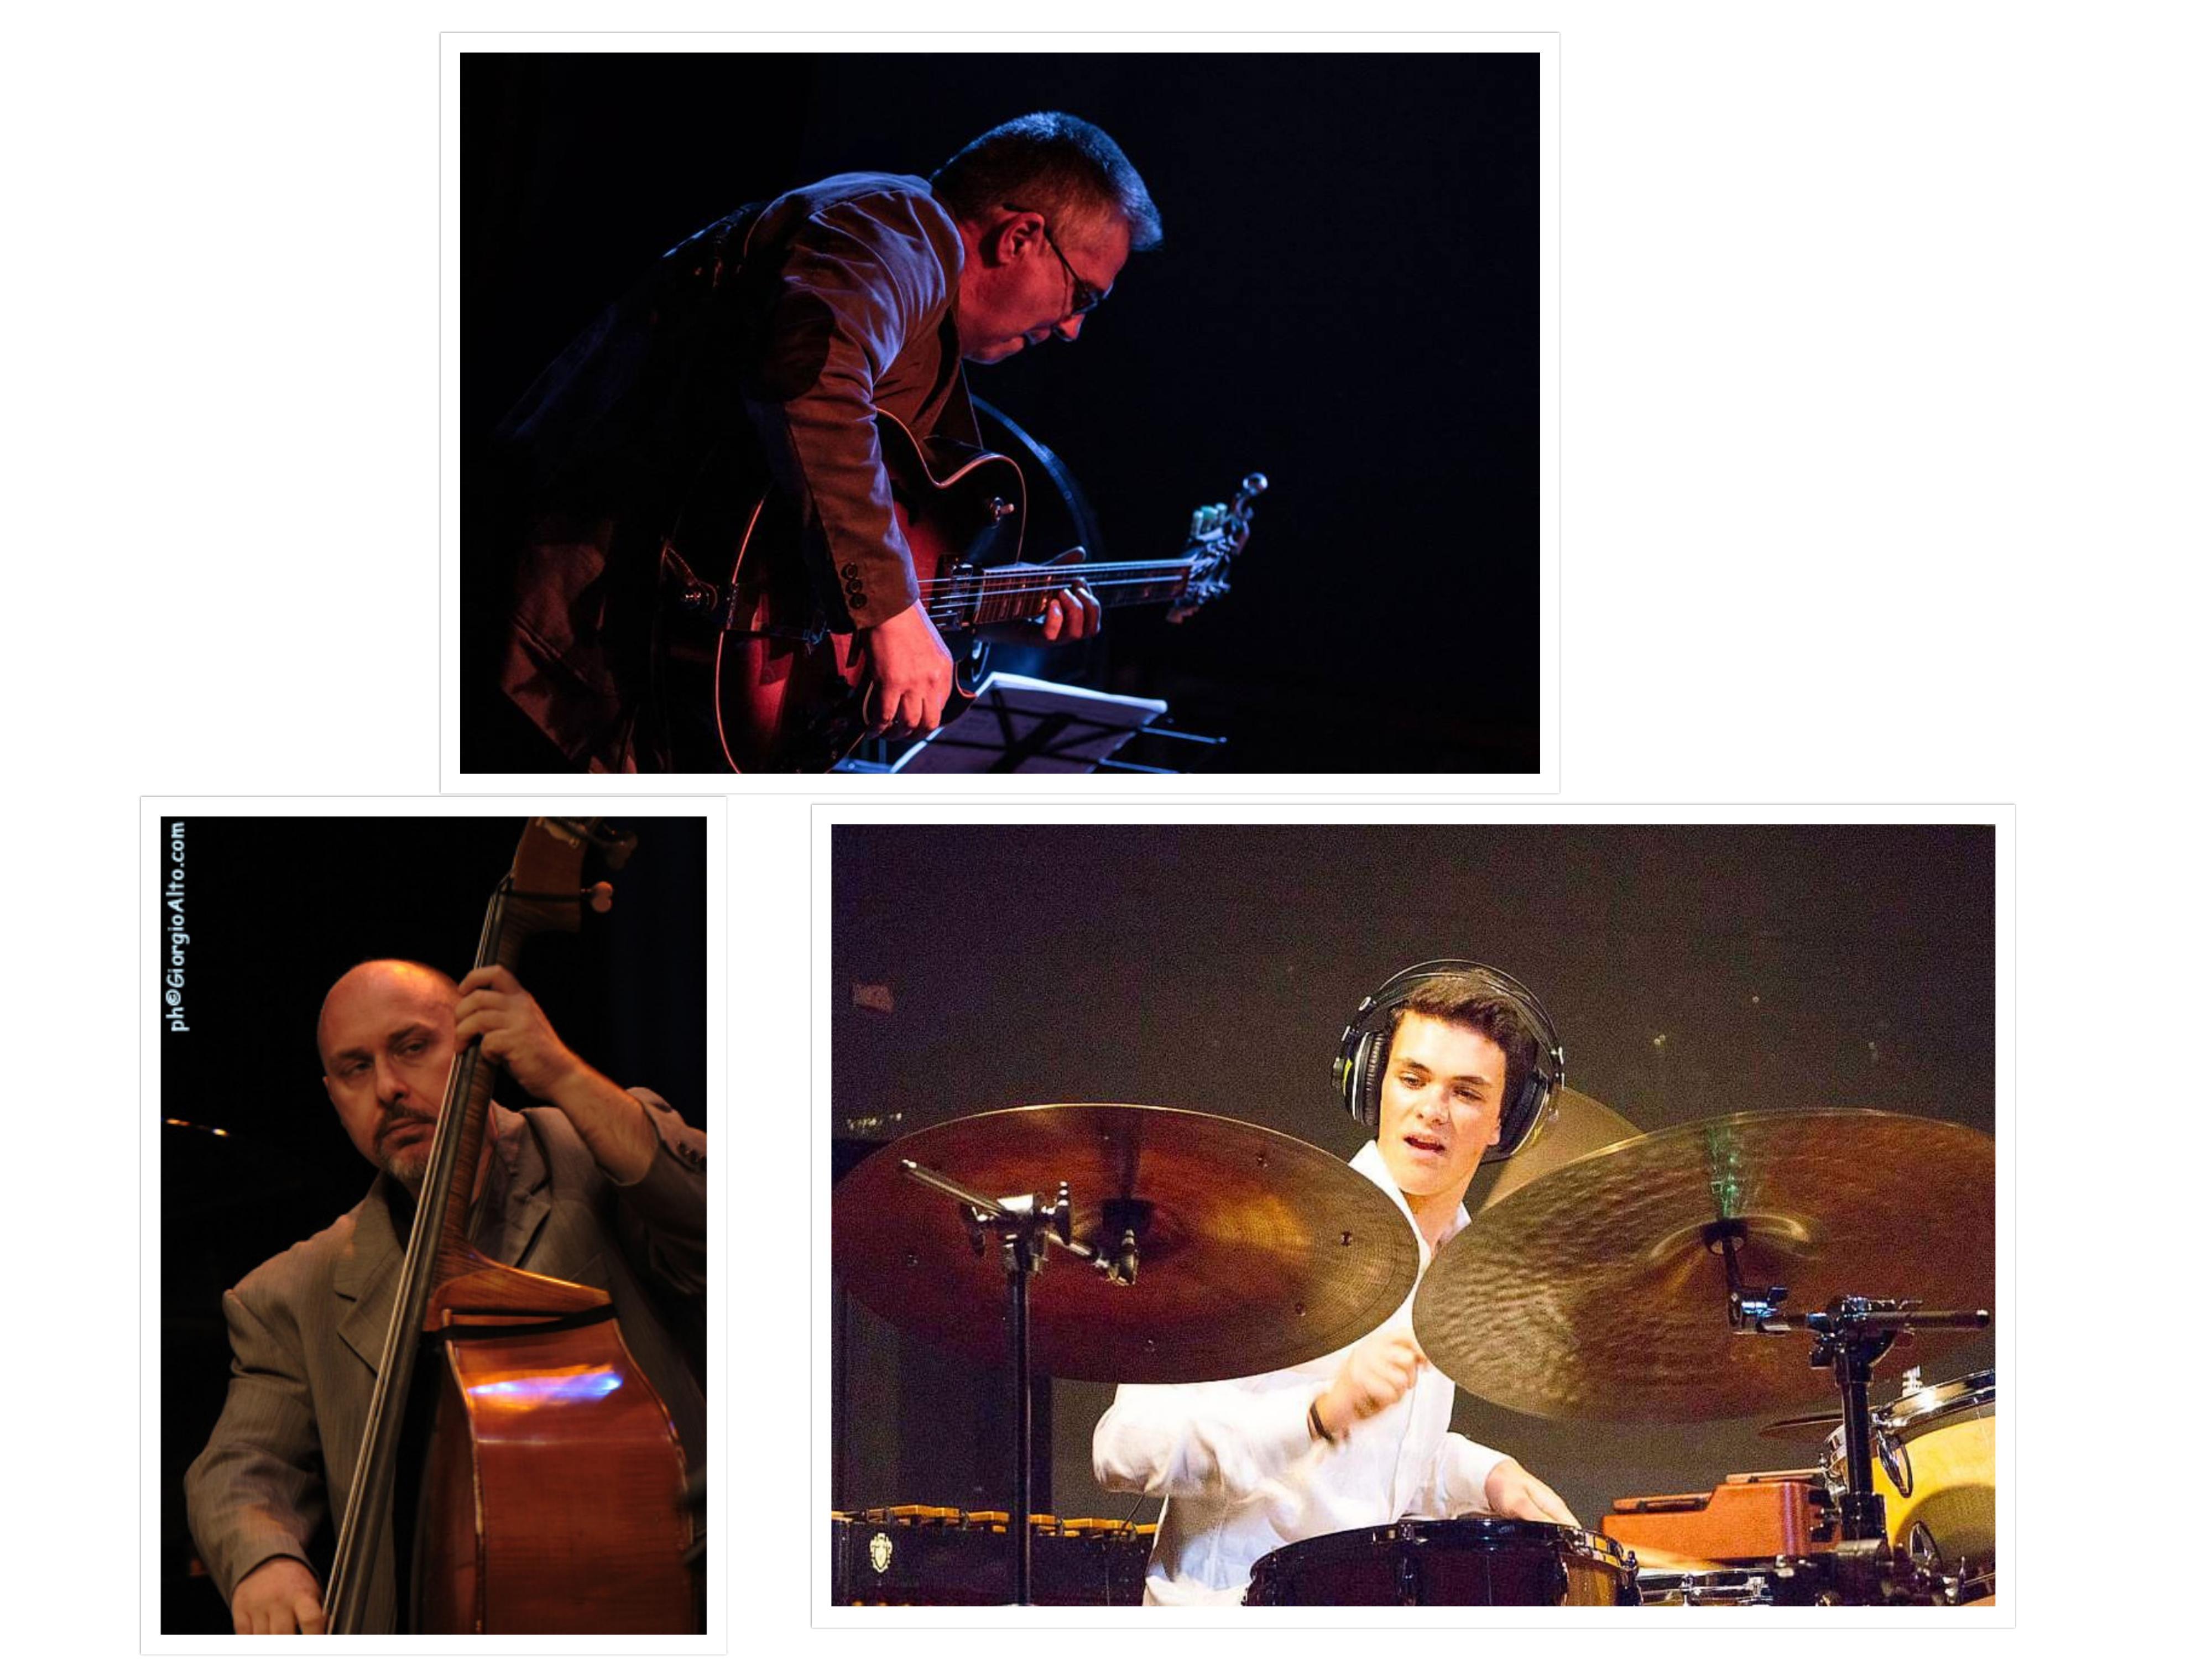 Jazz Day 2019  Anteprima Andora Jazz Festival 2019: Tessarollo Zunino Repola Jazz Trio